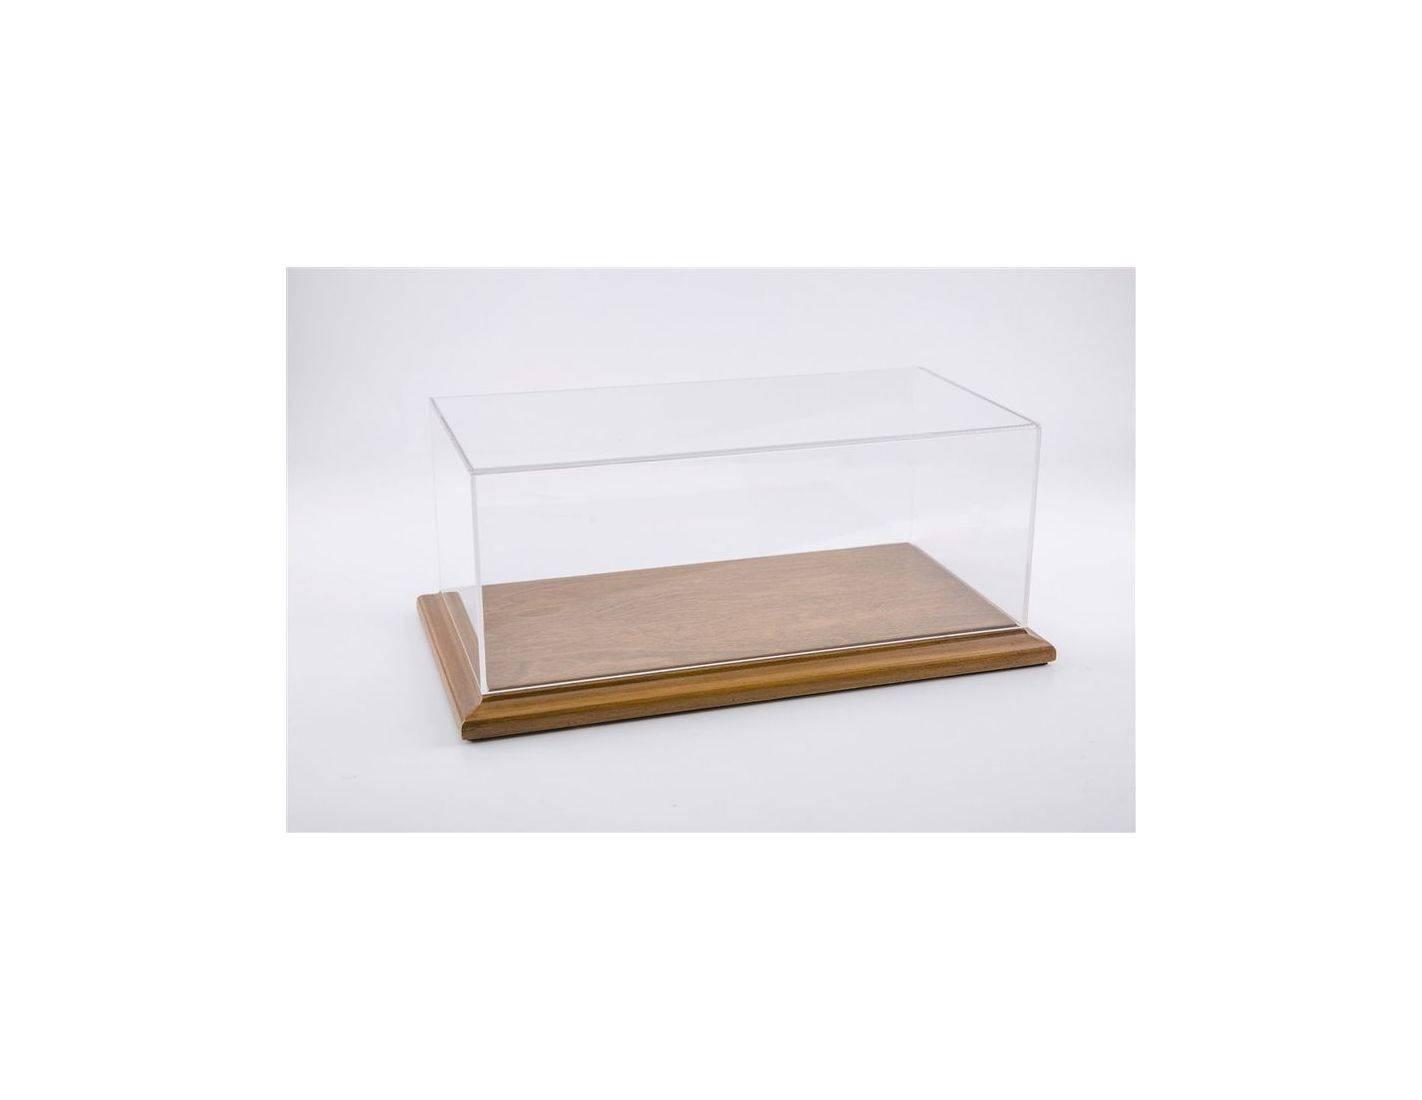 Atlantic ATL10063 MOLSHEIM DISPLAY CASE W/NOCE WOOD BASE (WIDE EDGE) mm 325x165x125 1:18 Modellino